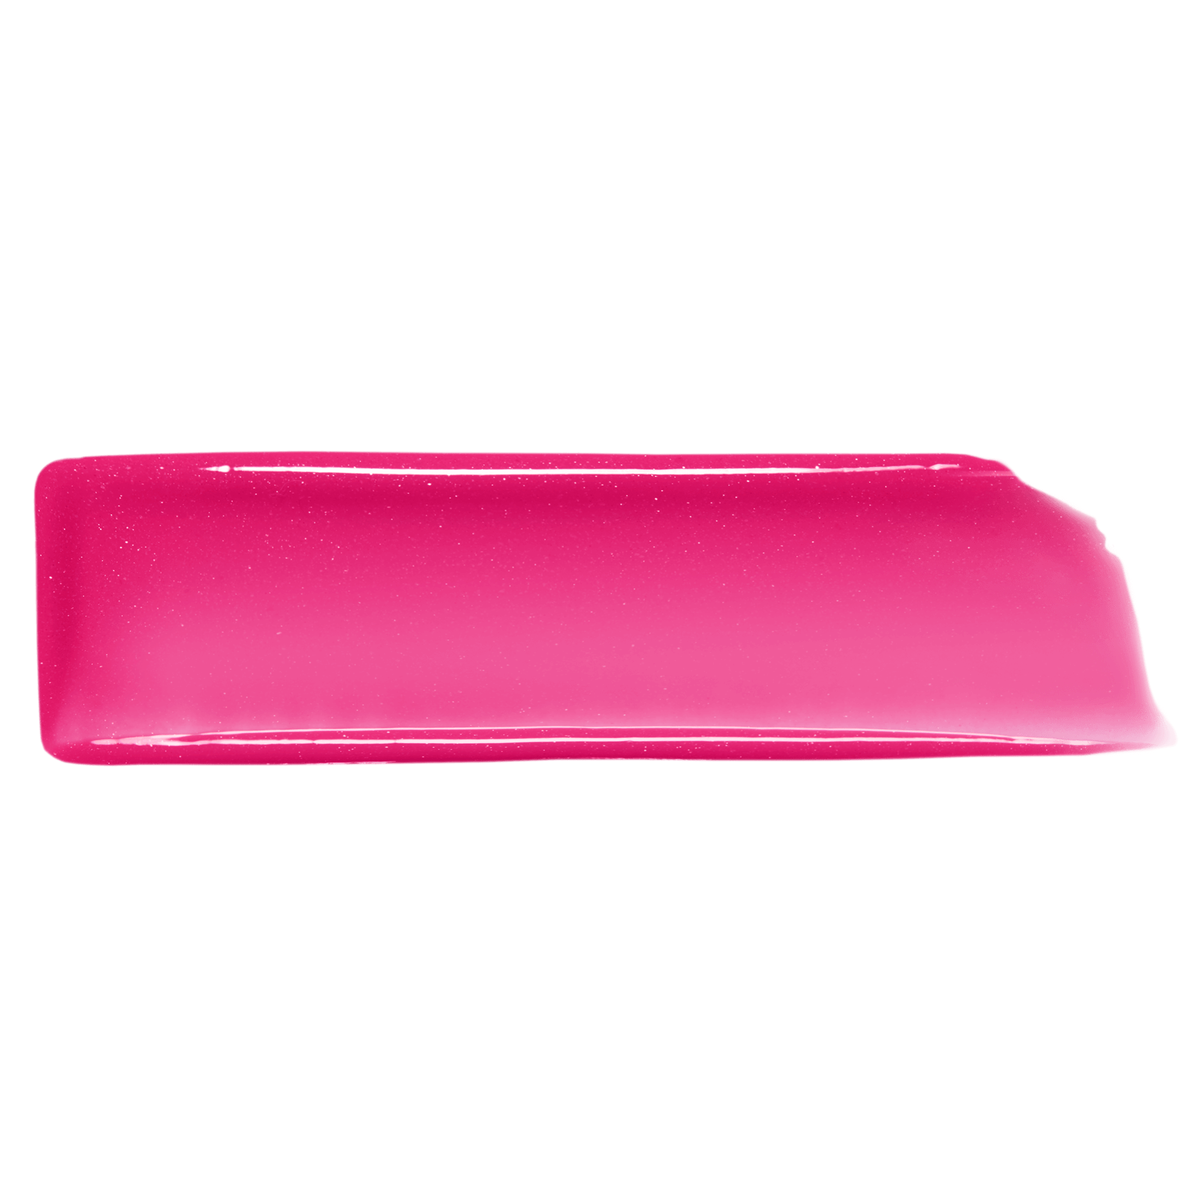 GIVENCHY Lipstick Rouge Interdit Vinyl Extreme Shine Colors 07 Fuchsia Illicit